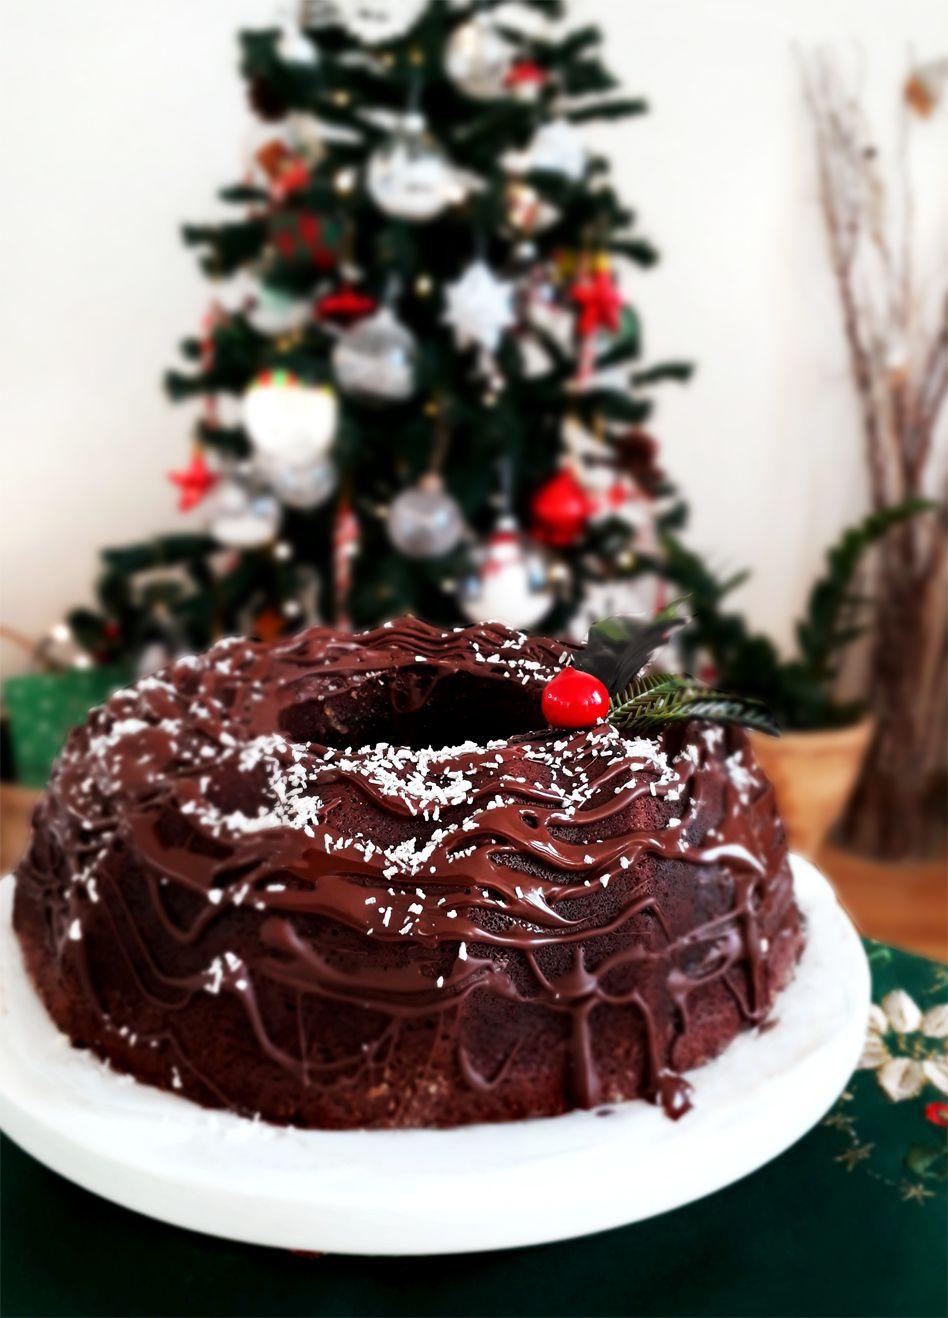 Christmas bundt cake au chocolat-coco & ganache au chocolat